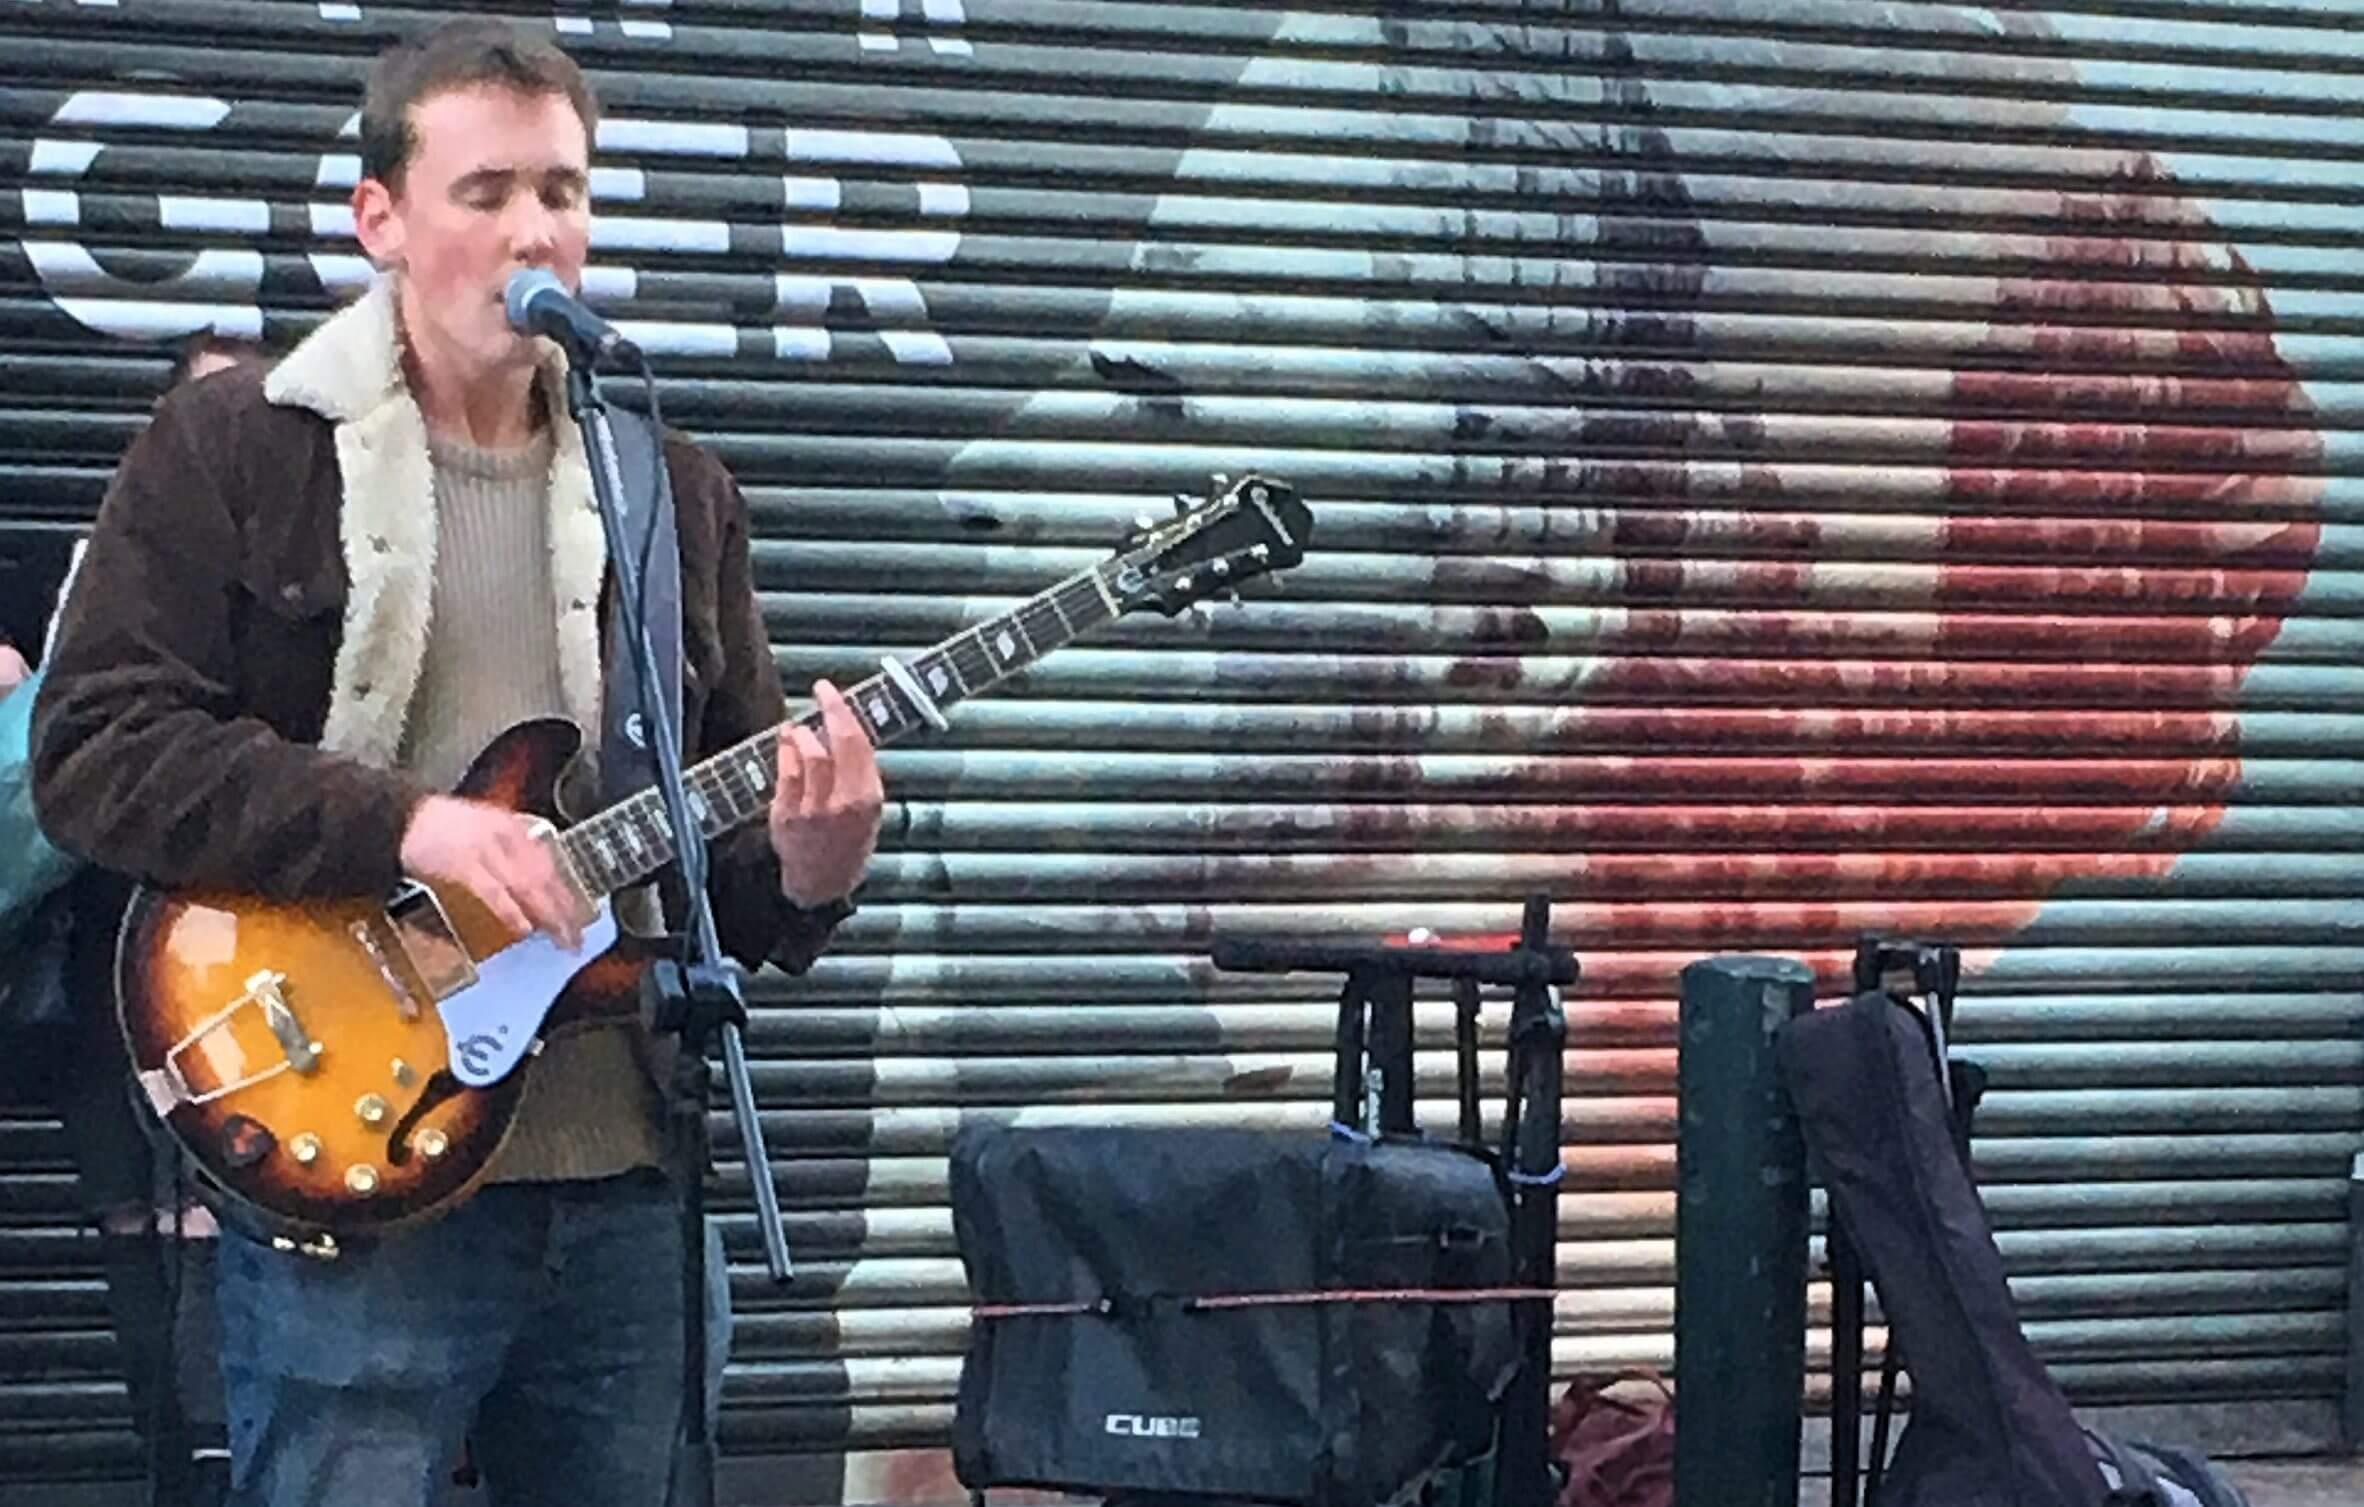 Buzz Apollo Music in Grafton Street. Image credit: Stine Solli Ødegård